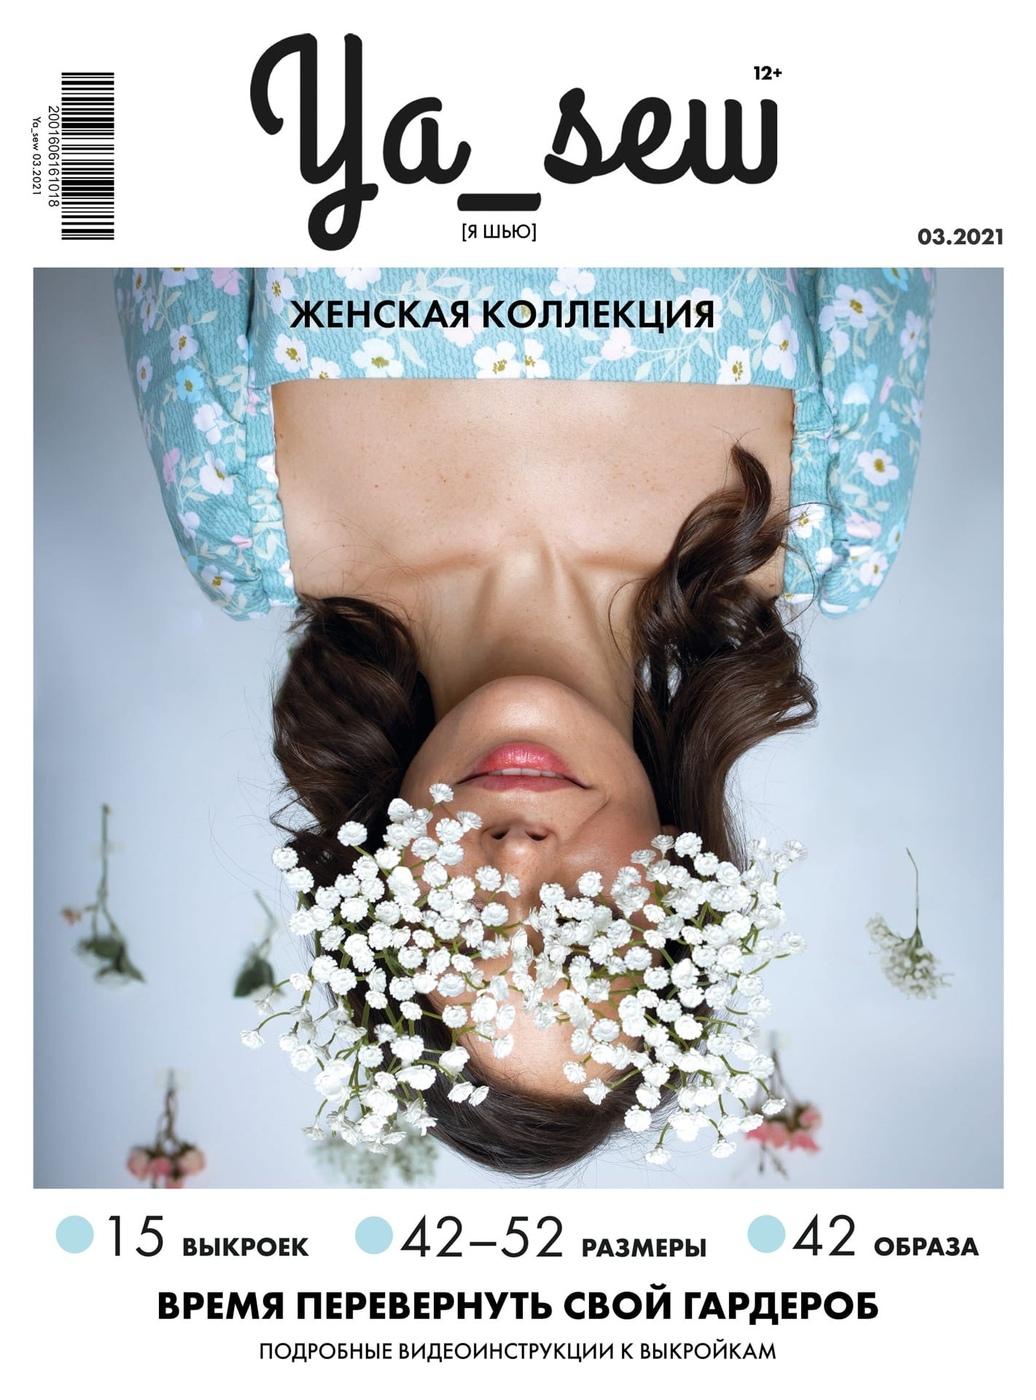 Ya Sew № 3/2021 журнал с выкройками для шитья